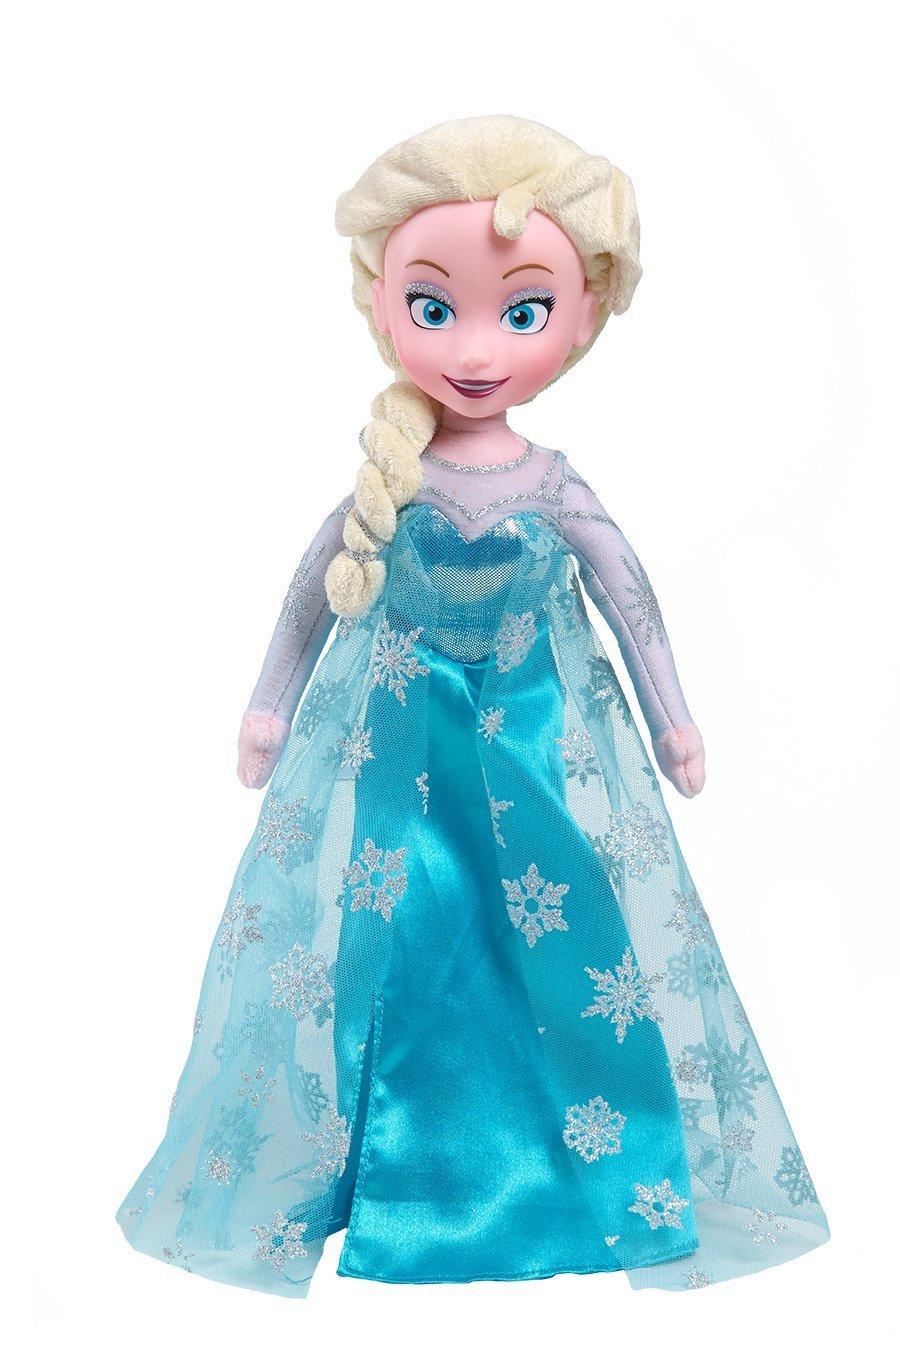 Frozen Elsa Soft Plush Doll $5 at Walmart.com